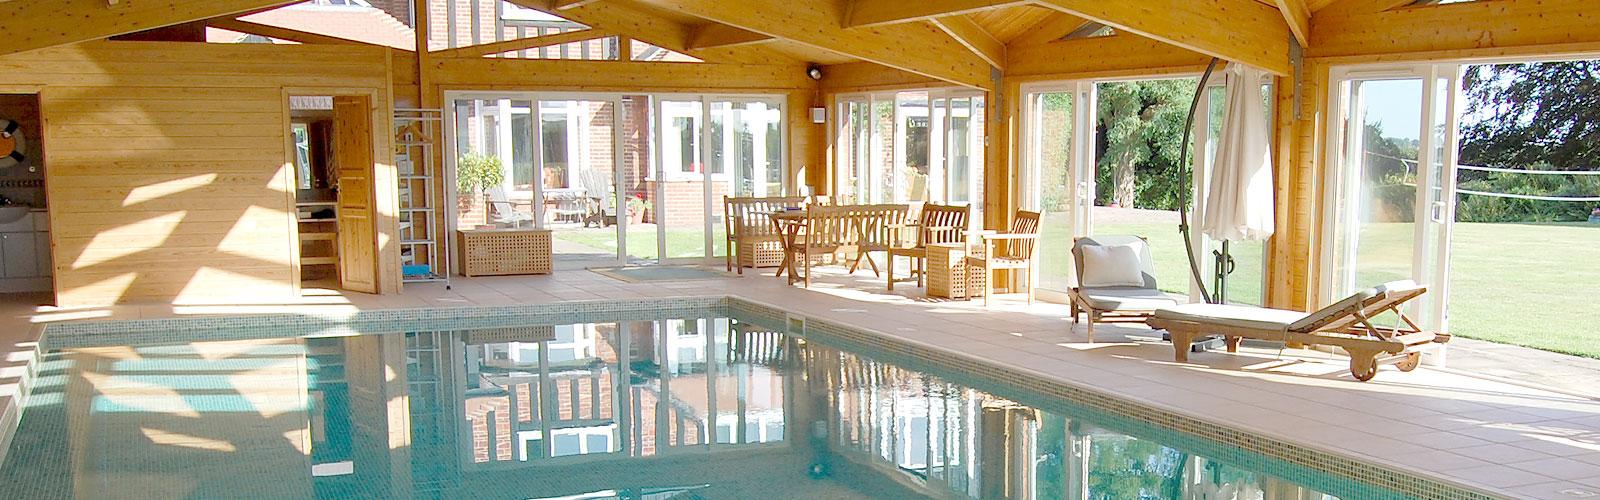 Indoor swimming pools buckland pool reigate surrey for Indoor swimming pool building regulations